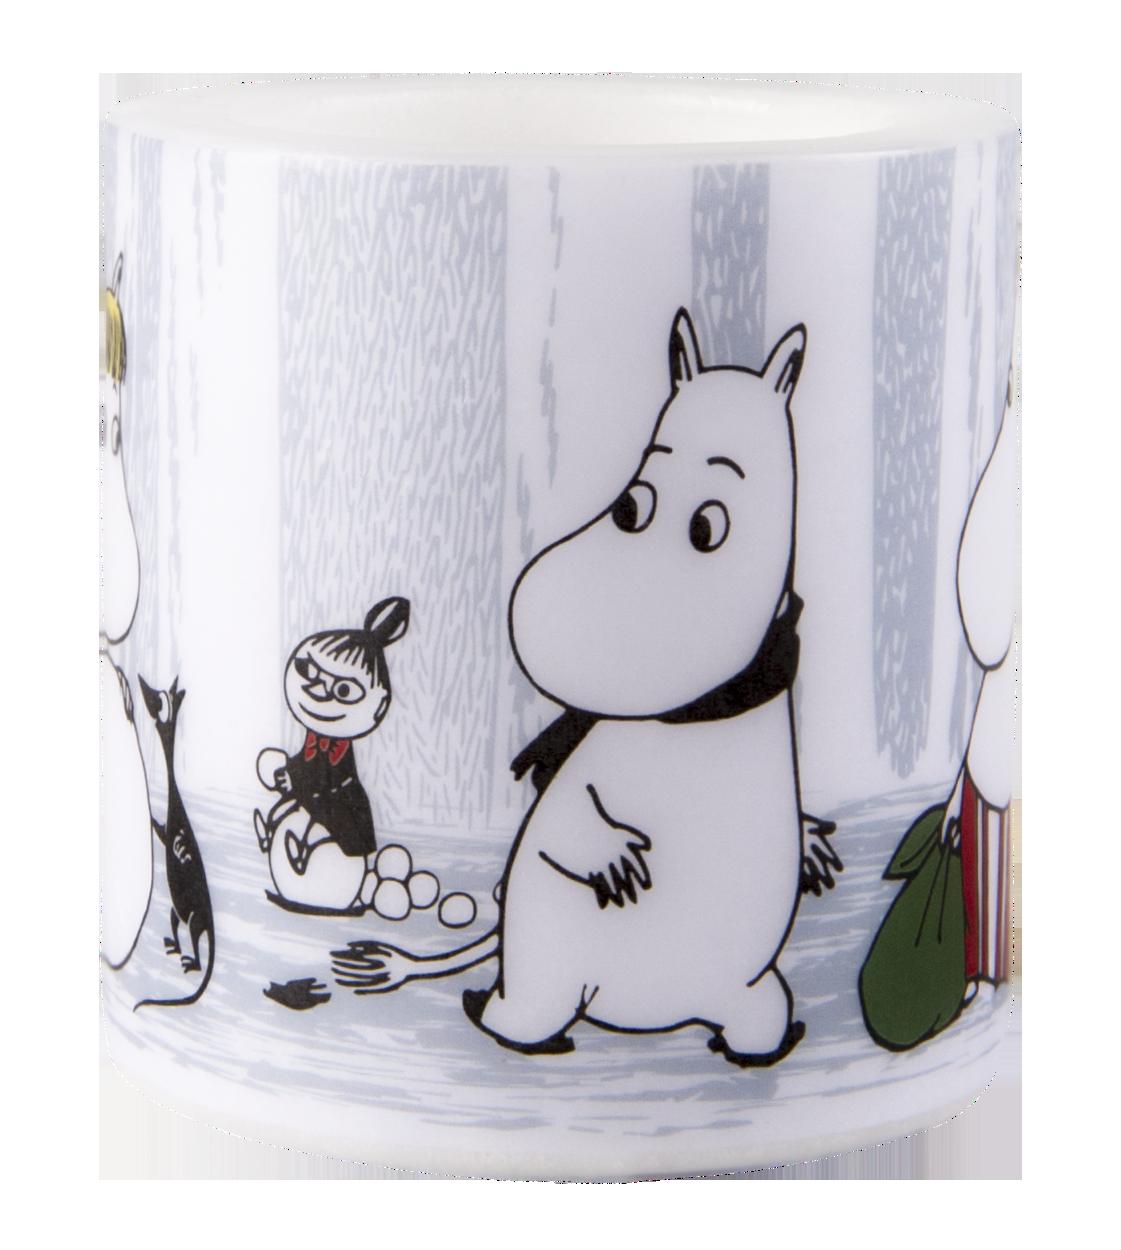 Muurla Moomin Winter Trip candle 8cm